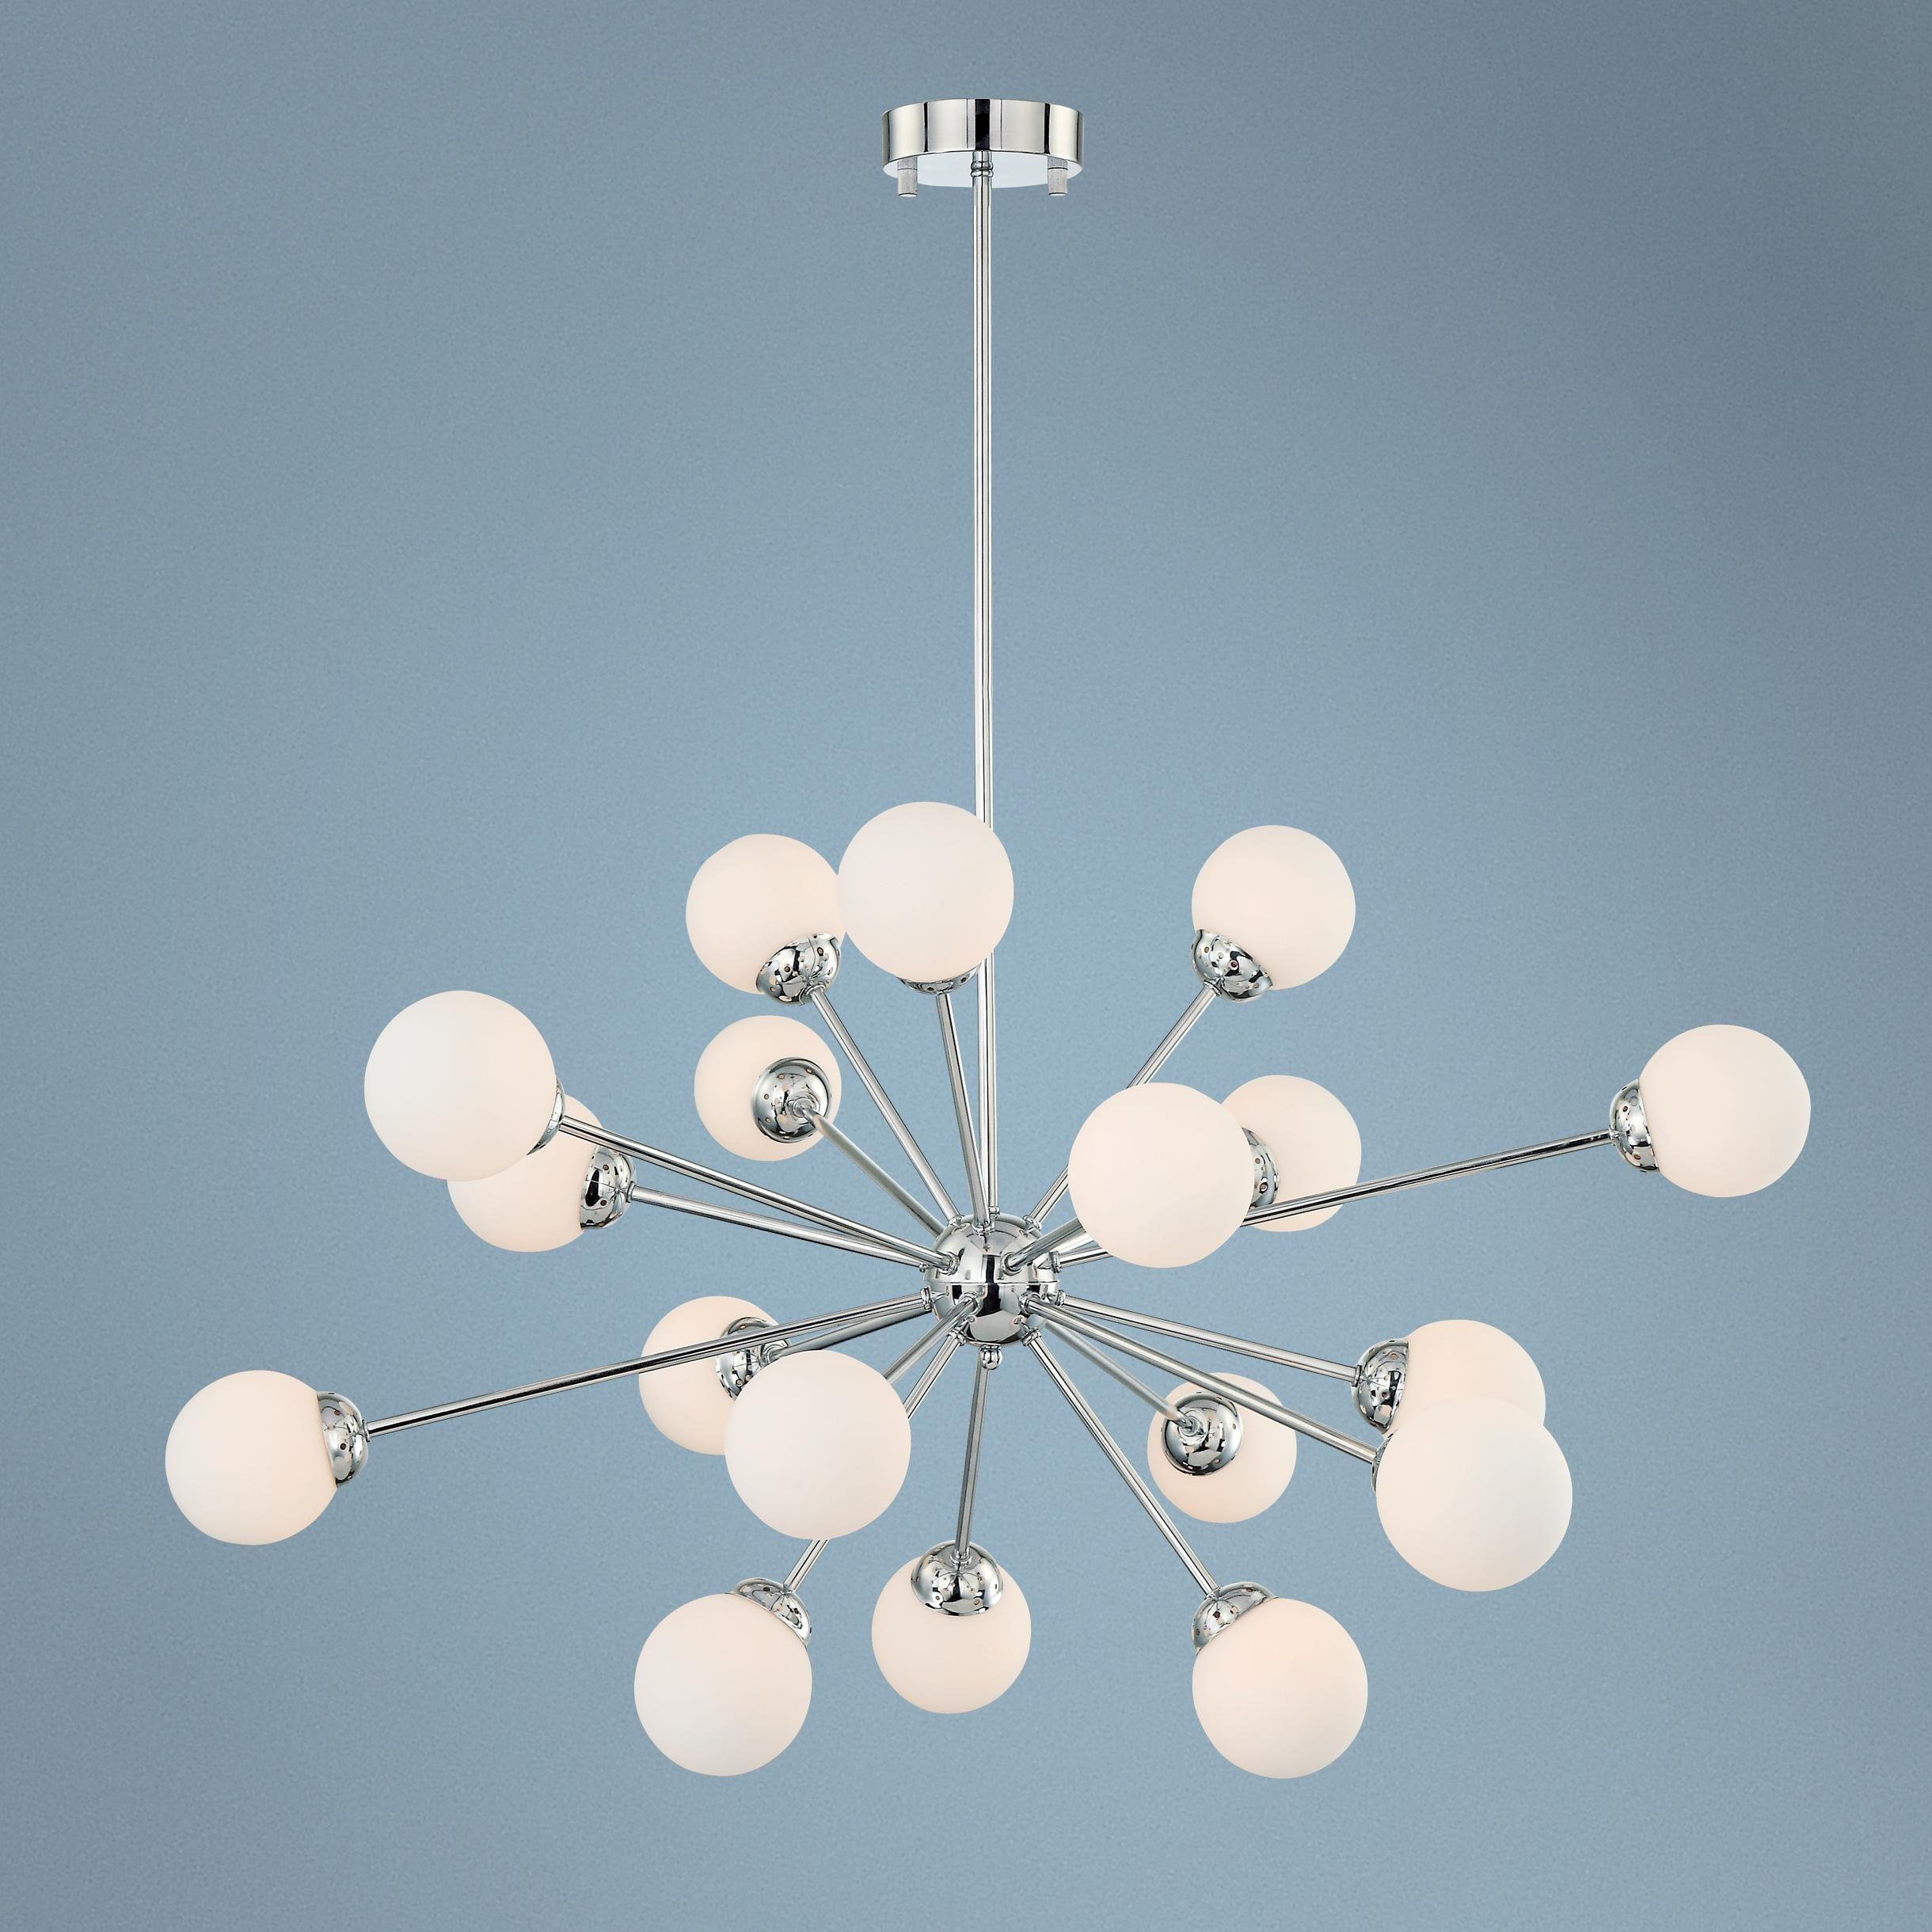 Possini euro design opal glass pendant chandelier lights